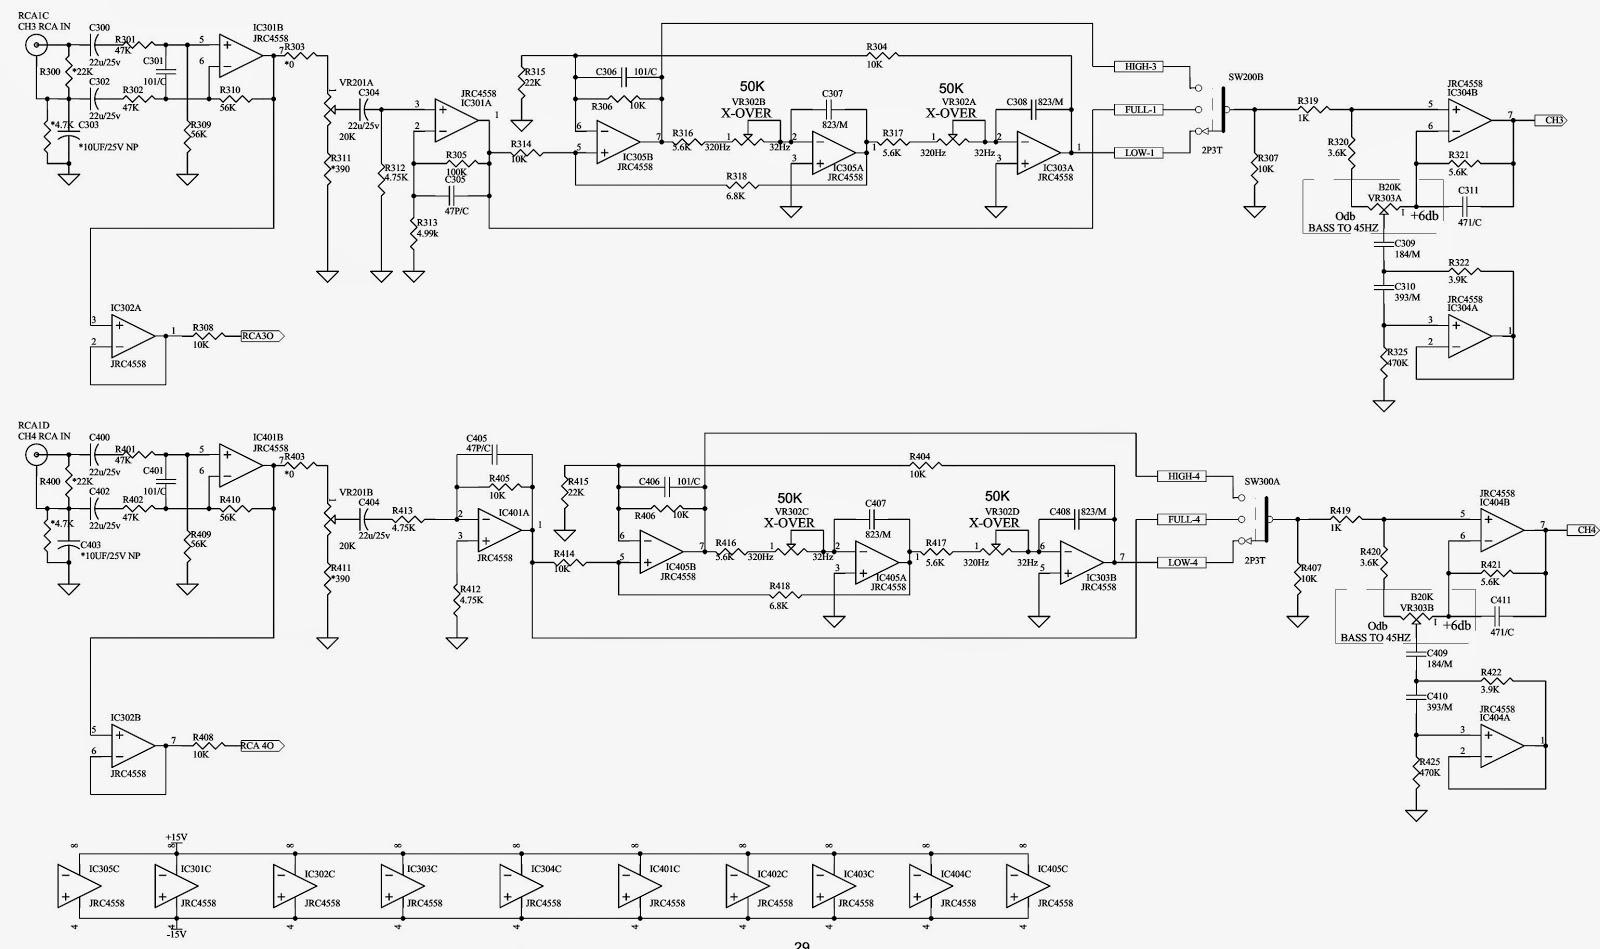 jbl marine stereo wiring diagram electrical wiring diagram symbols